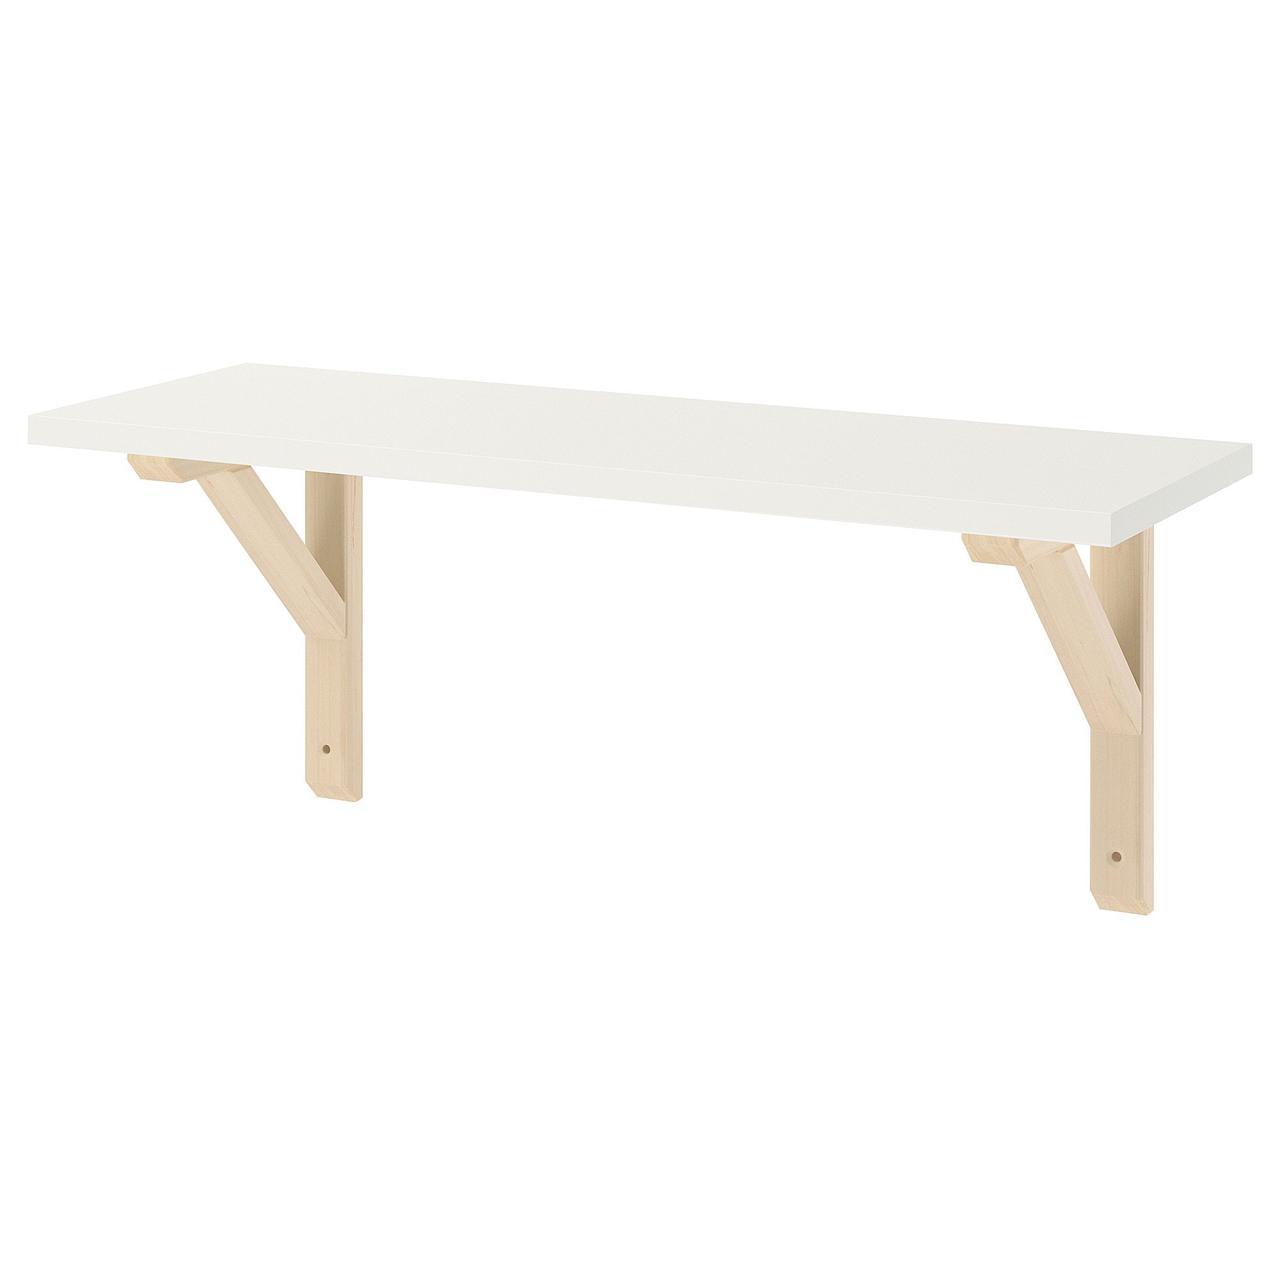 Полка навесная IKEA BURHULT / SANDSHULT белая осина 59x20 см 093.259.81